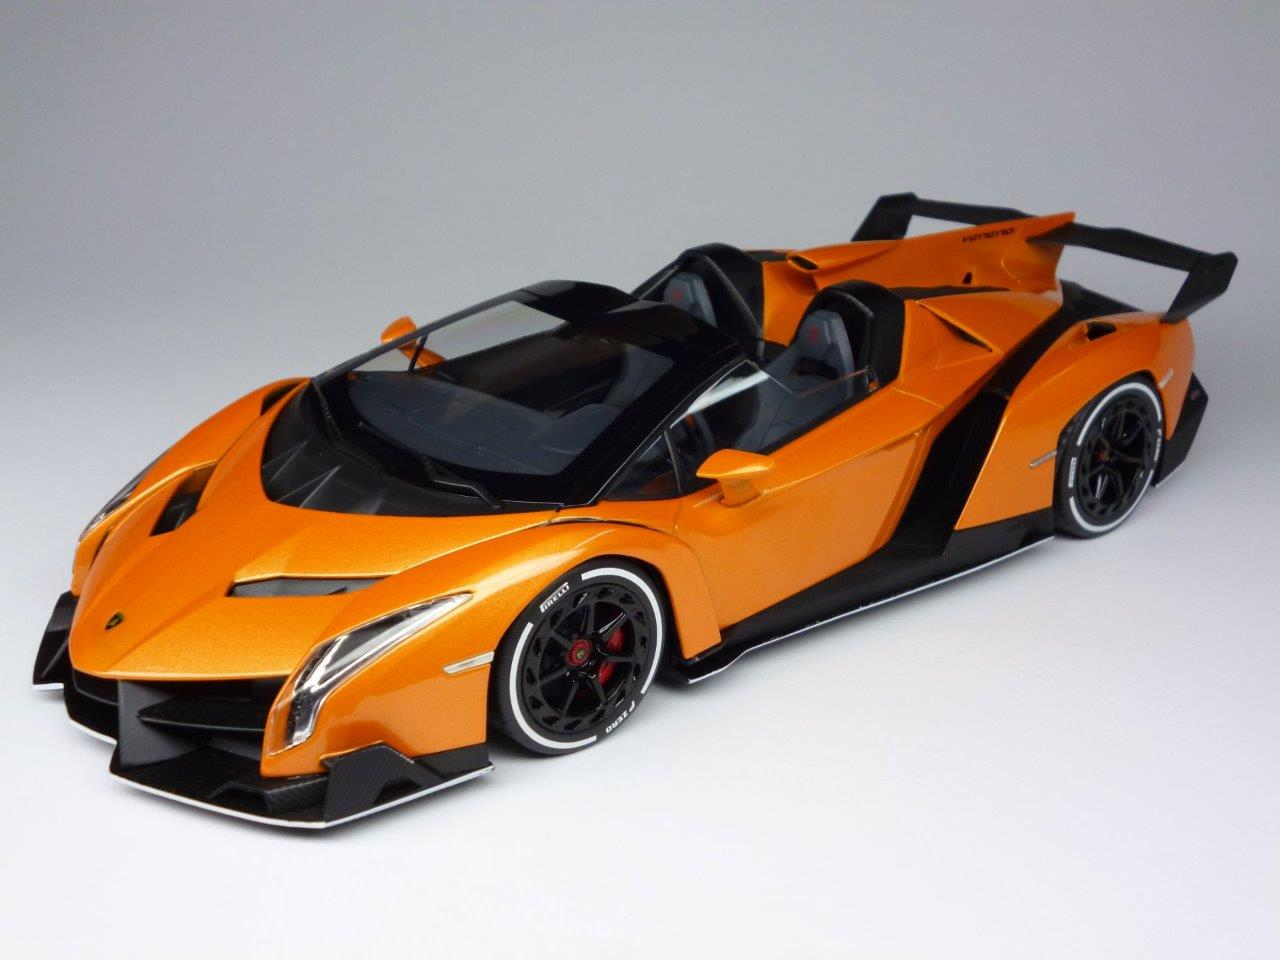 kyosho 1 18 lamborghini veneno roadster orange. Black Bedroom Furniture Sets. Home Design Ideas